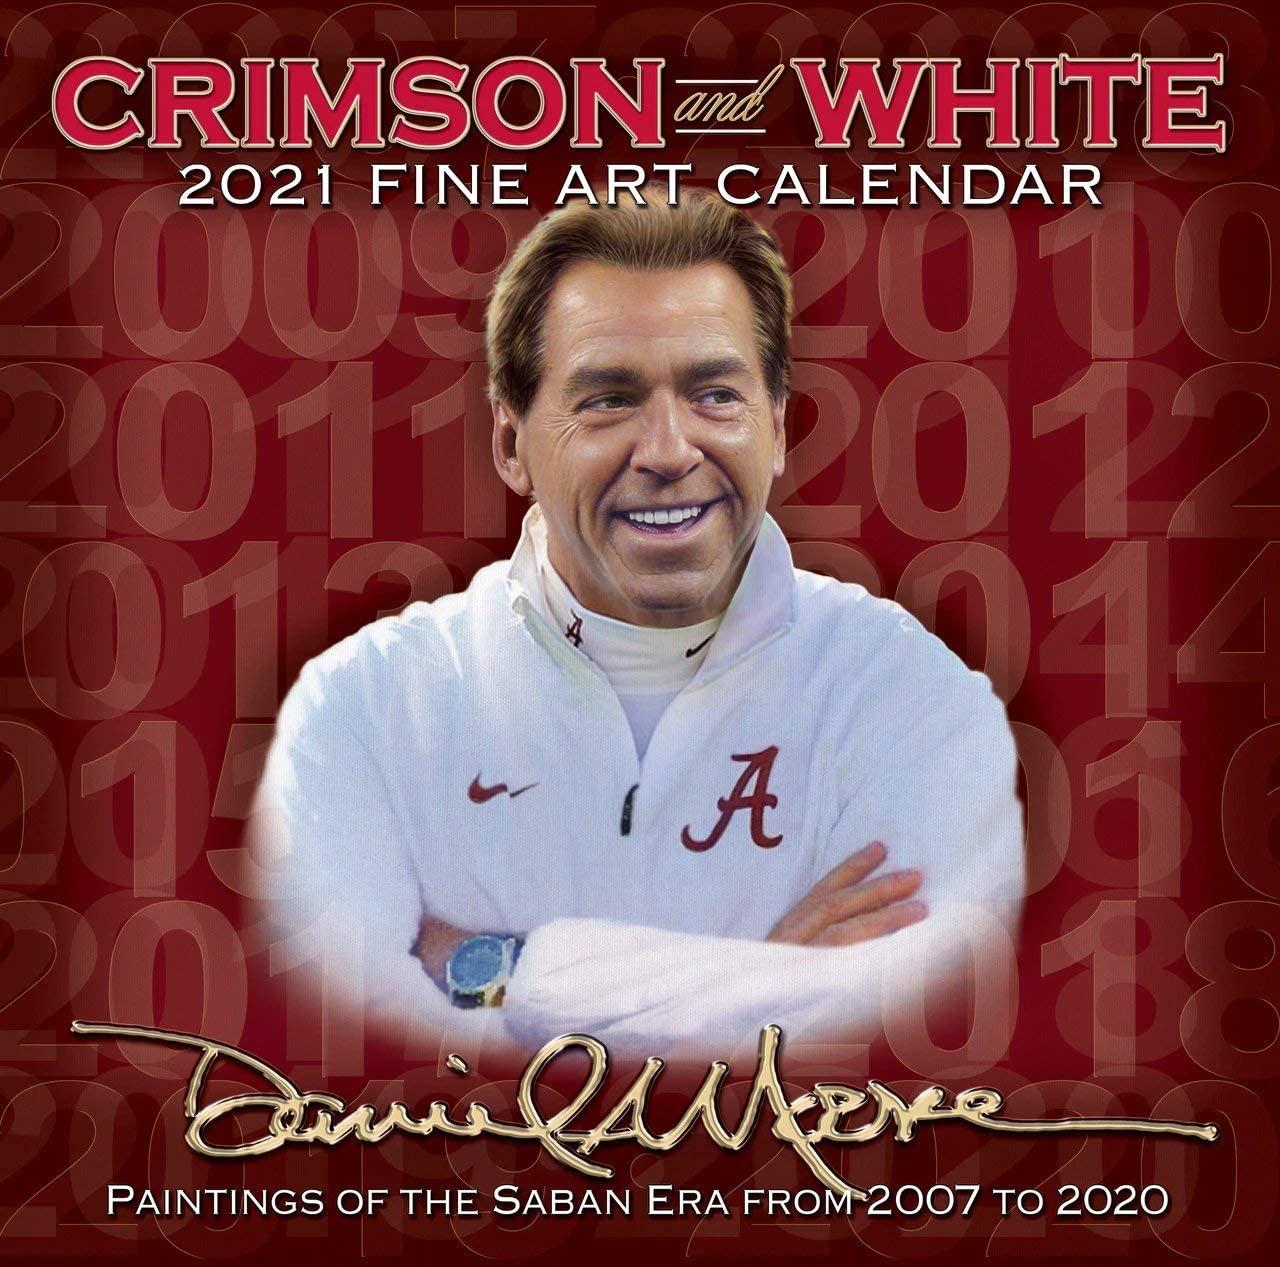 Daniel Moore's 2021 Alabama Football Fine Art Calendar